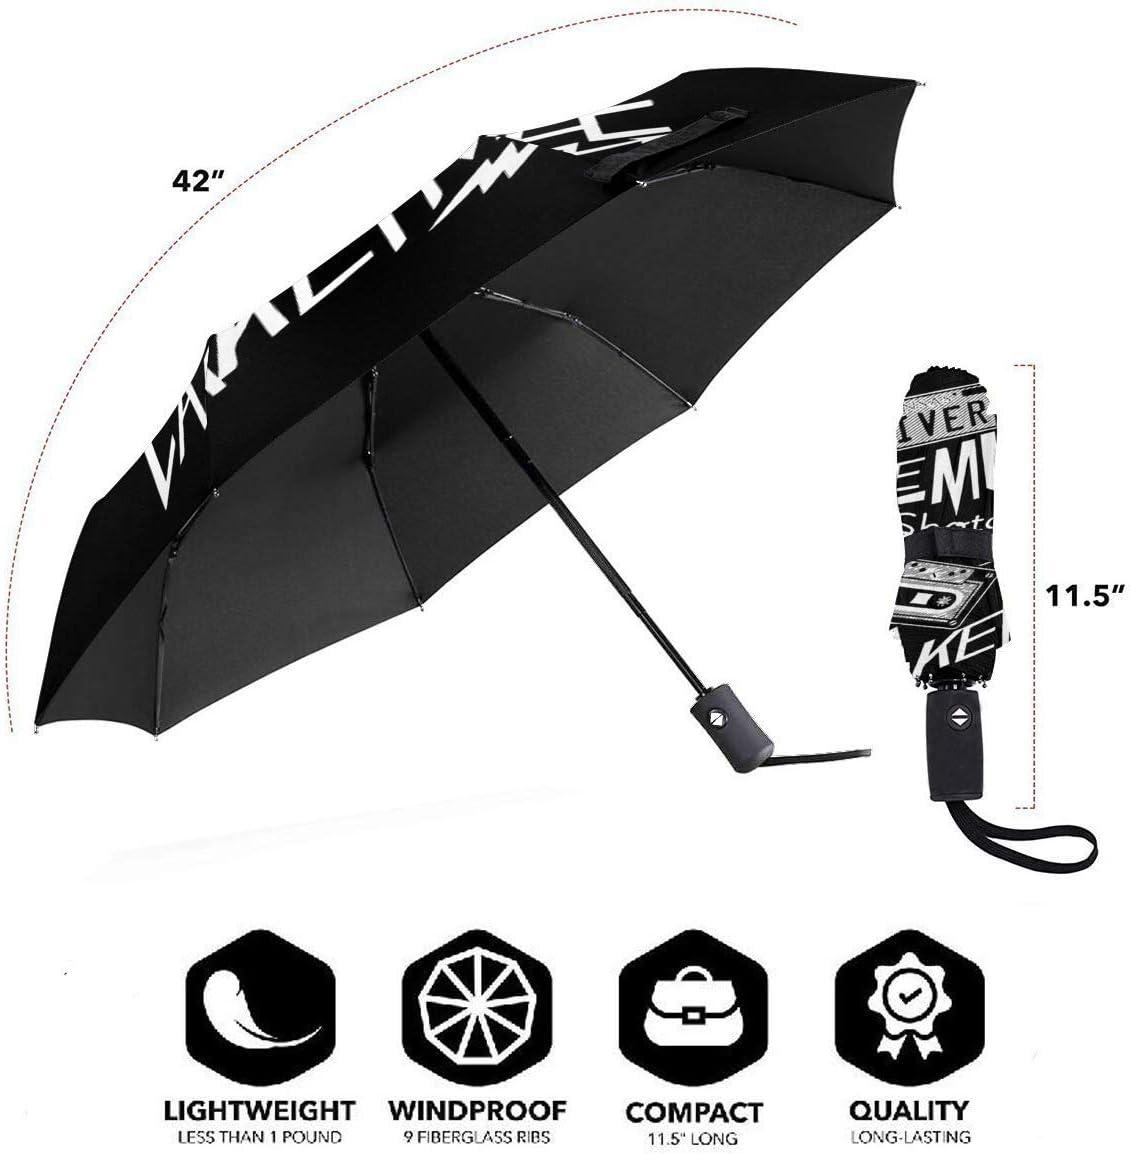 Windproof Reinforced Canopy Ergonomic Handle Auto Open//Close Multiple Colors Supernatural Driver Picks The Music Compact Travel Umbrella